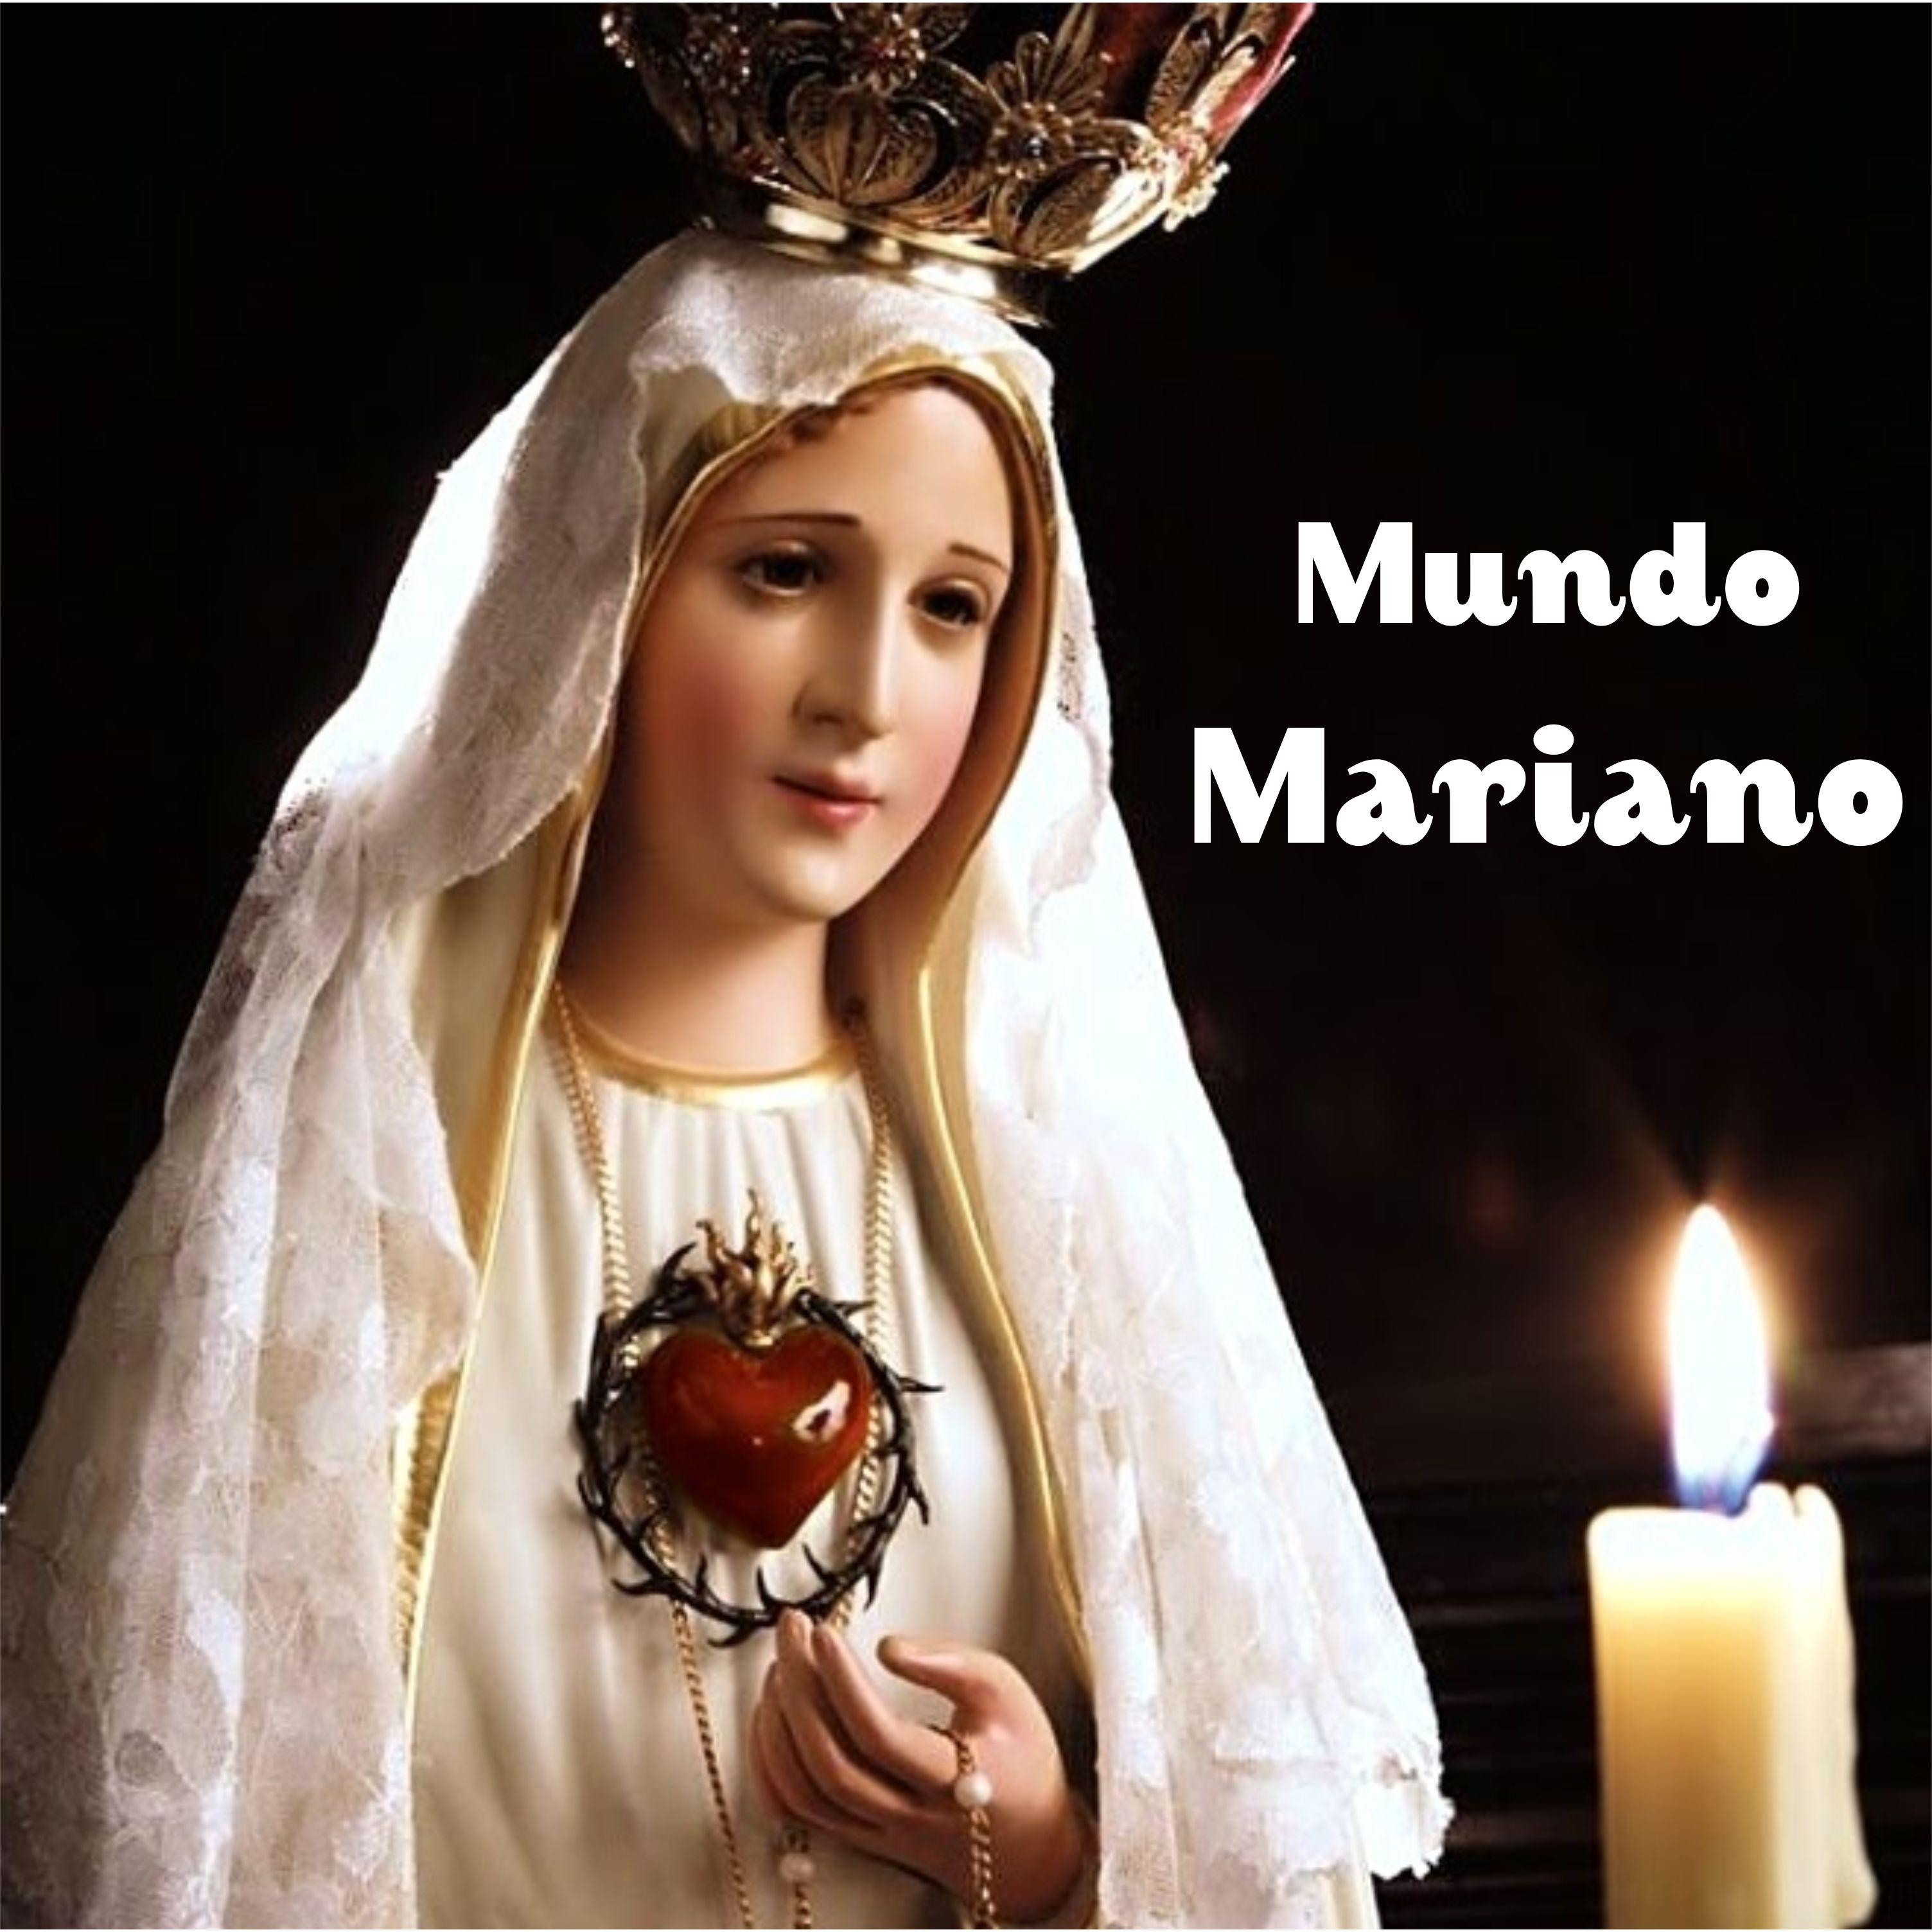 MUNDO MARIANO